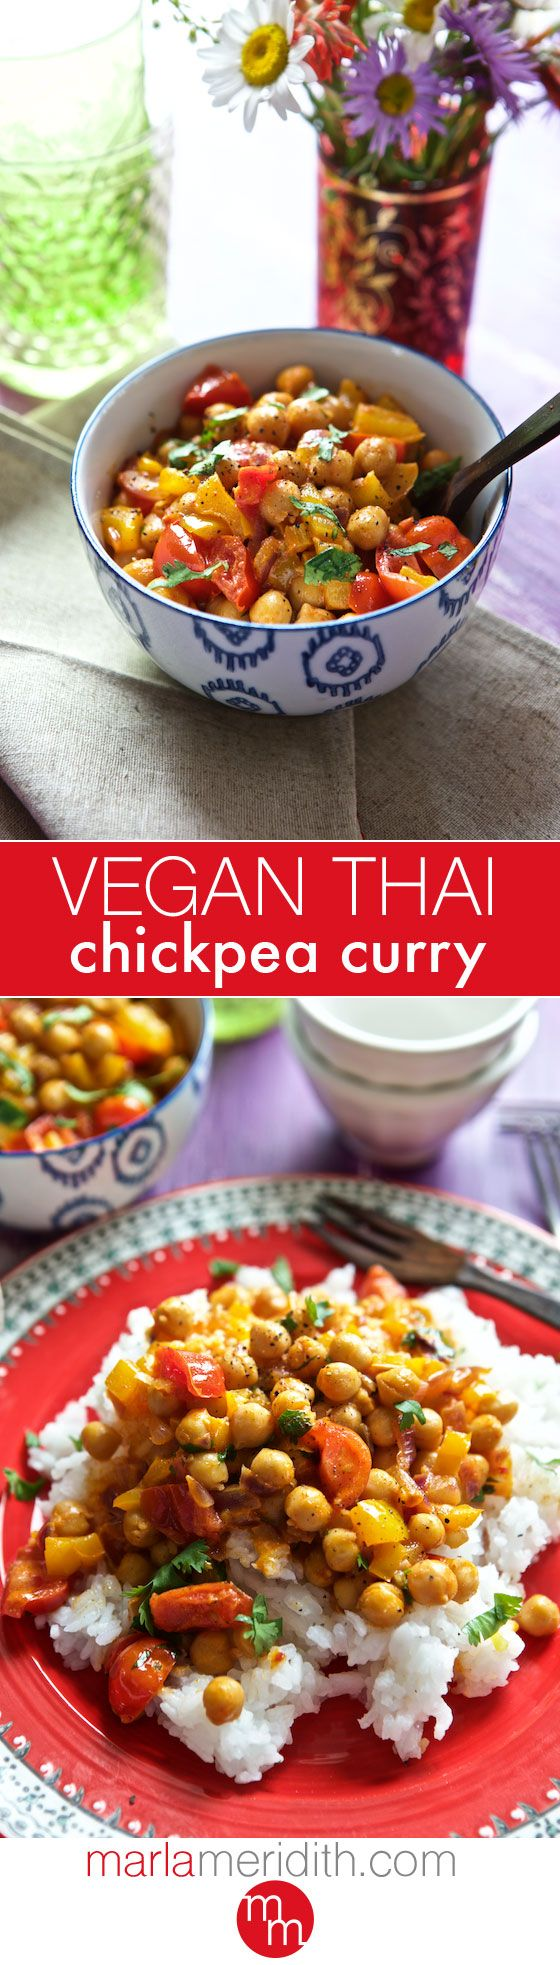 Vegan Thai Chickpea Curry | MarlaMeridith.com ( @marlameridith )